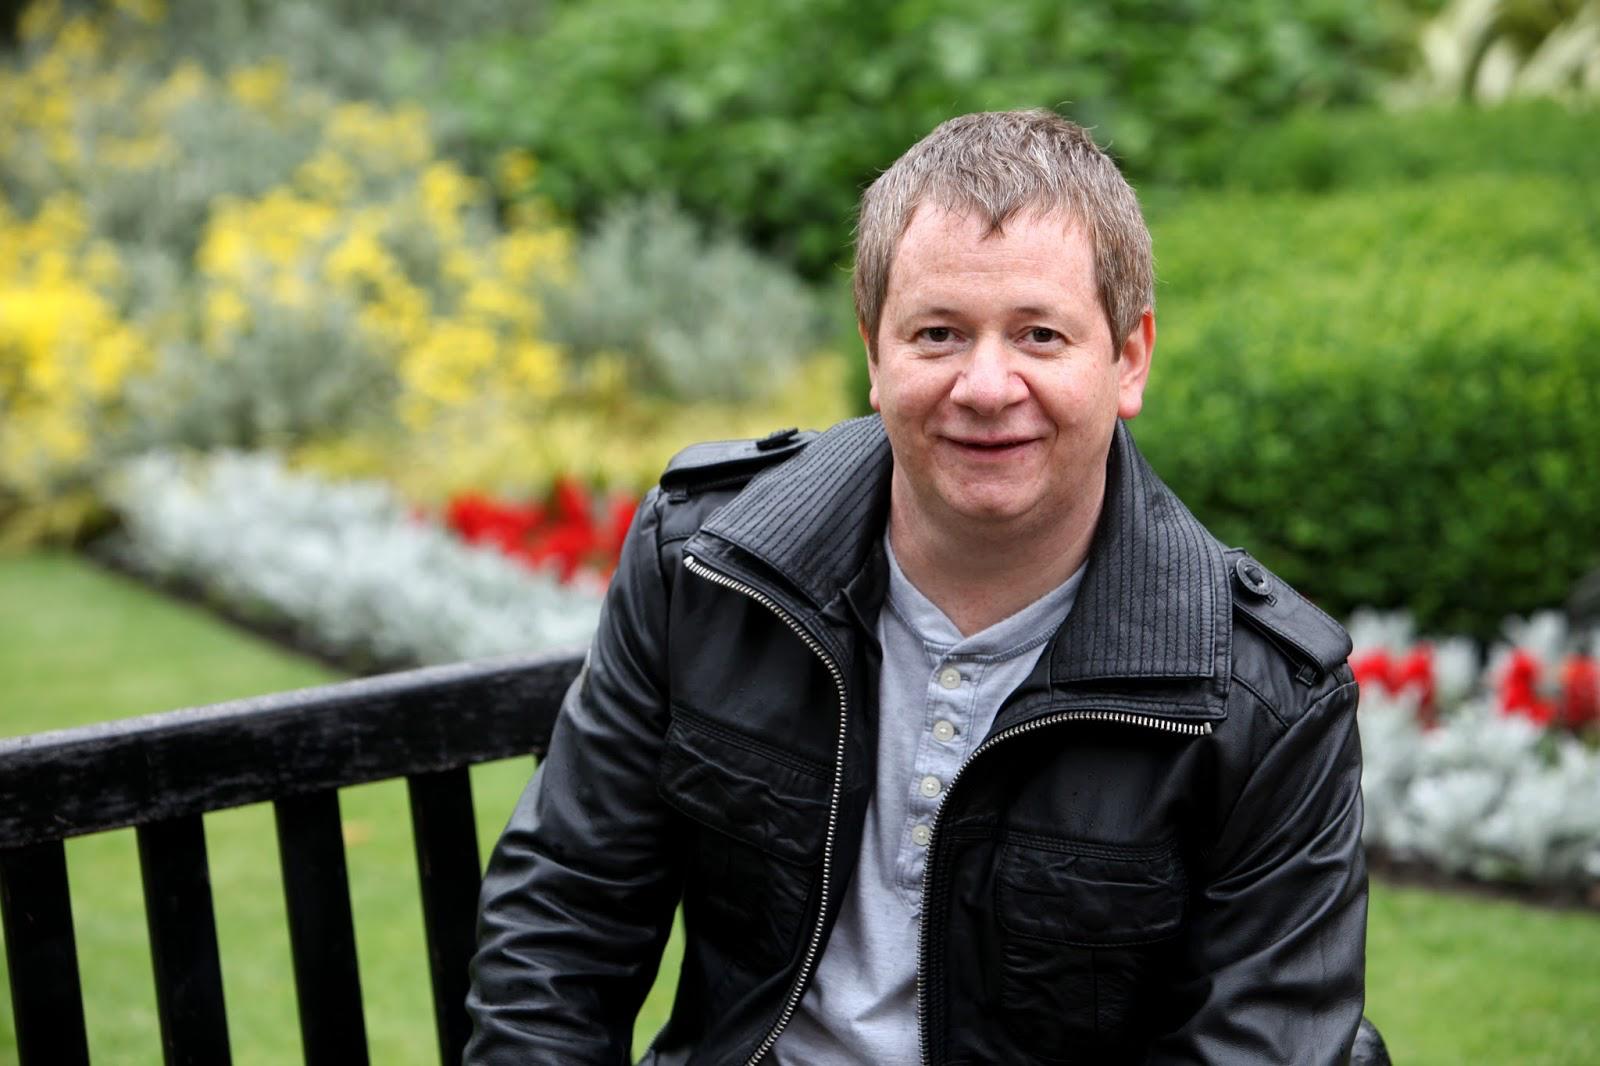 Dave Leadbeater